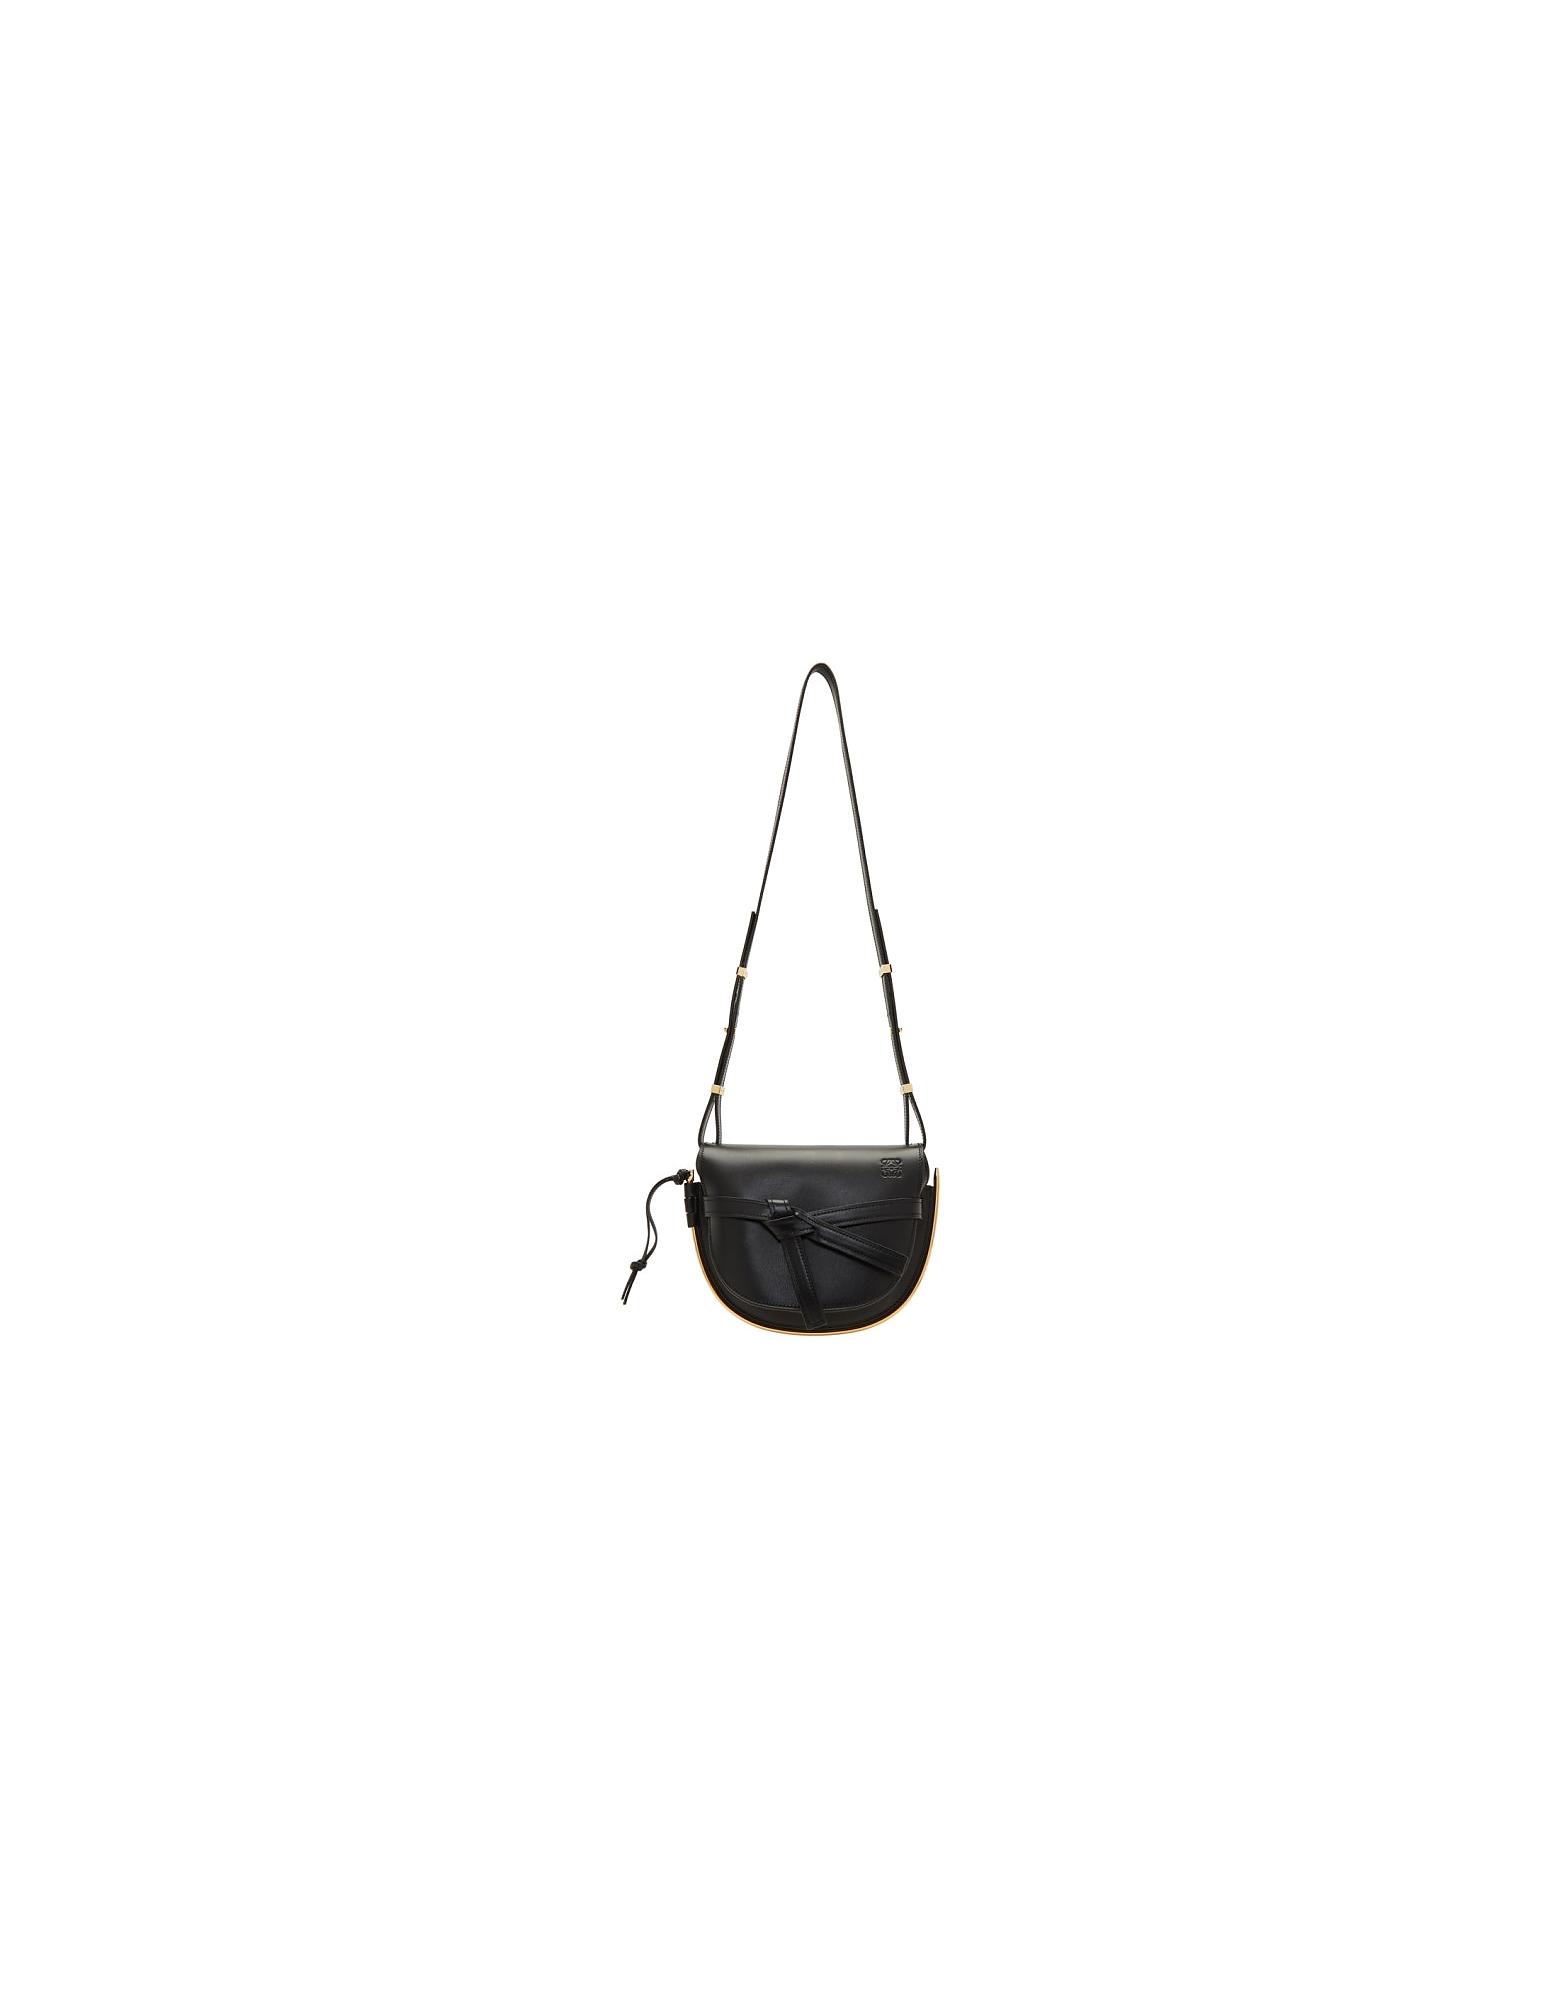 Loewe Designer Handbags, Black Small Gate Frame Bag